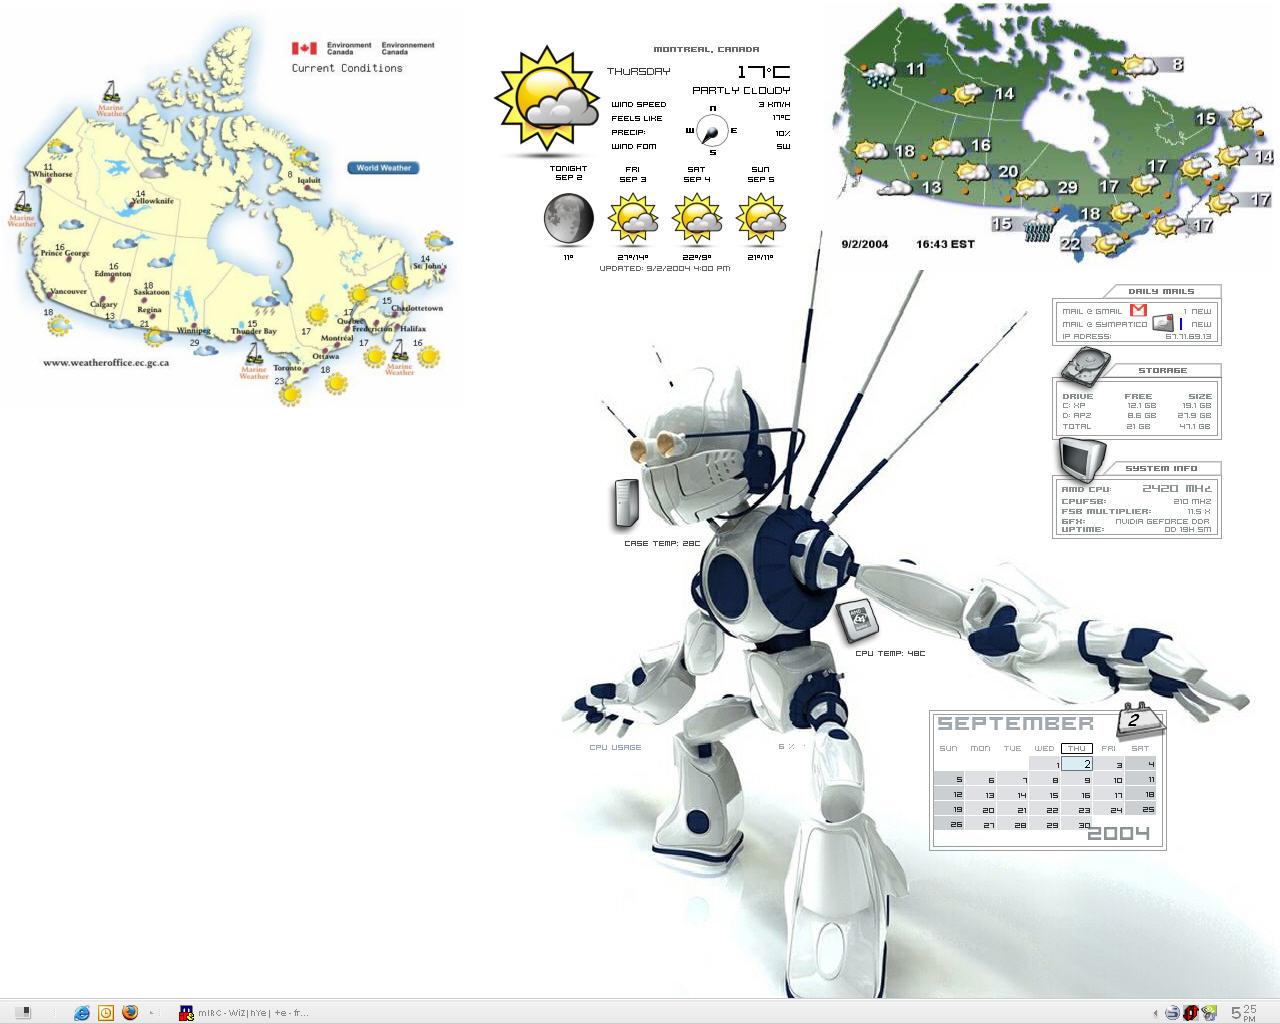 Title: Robot